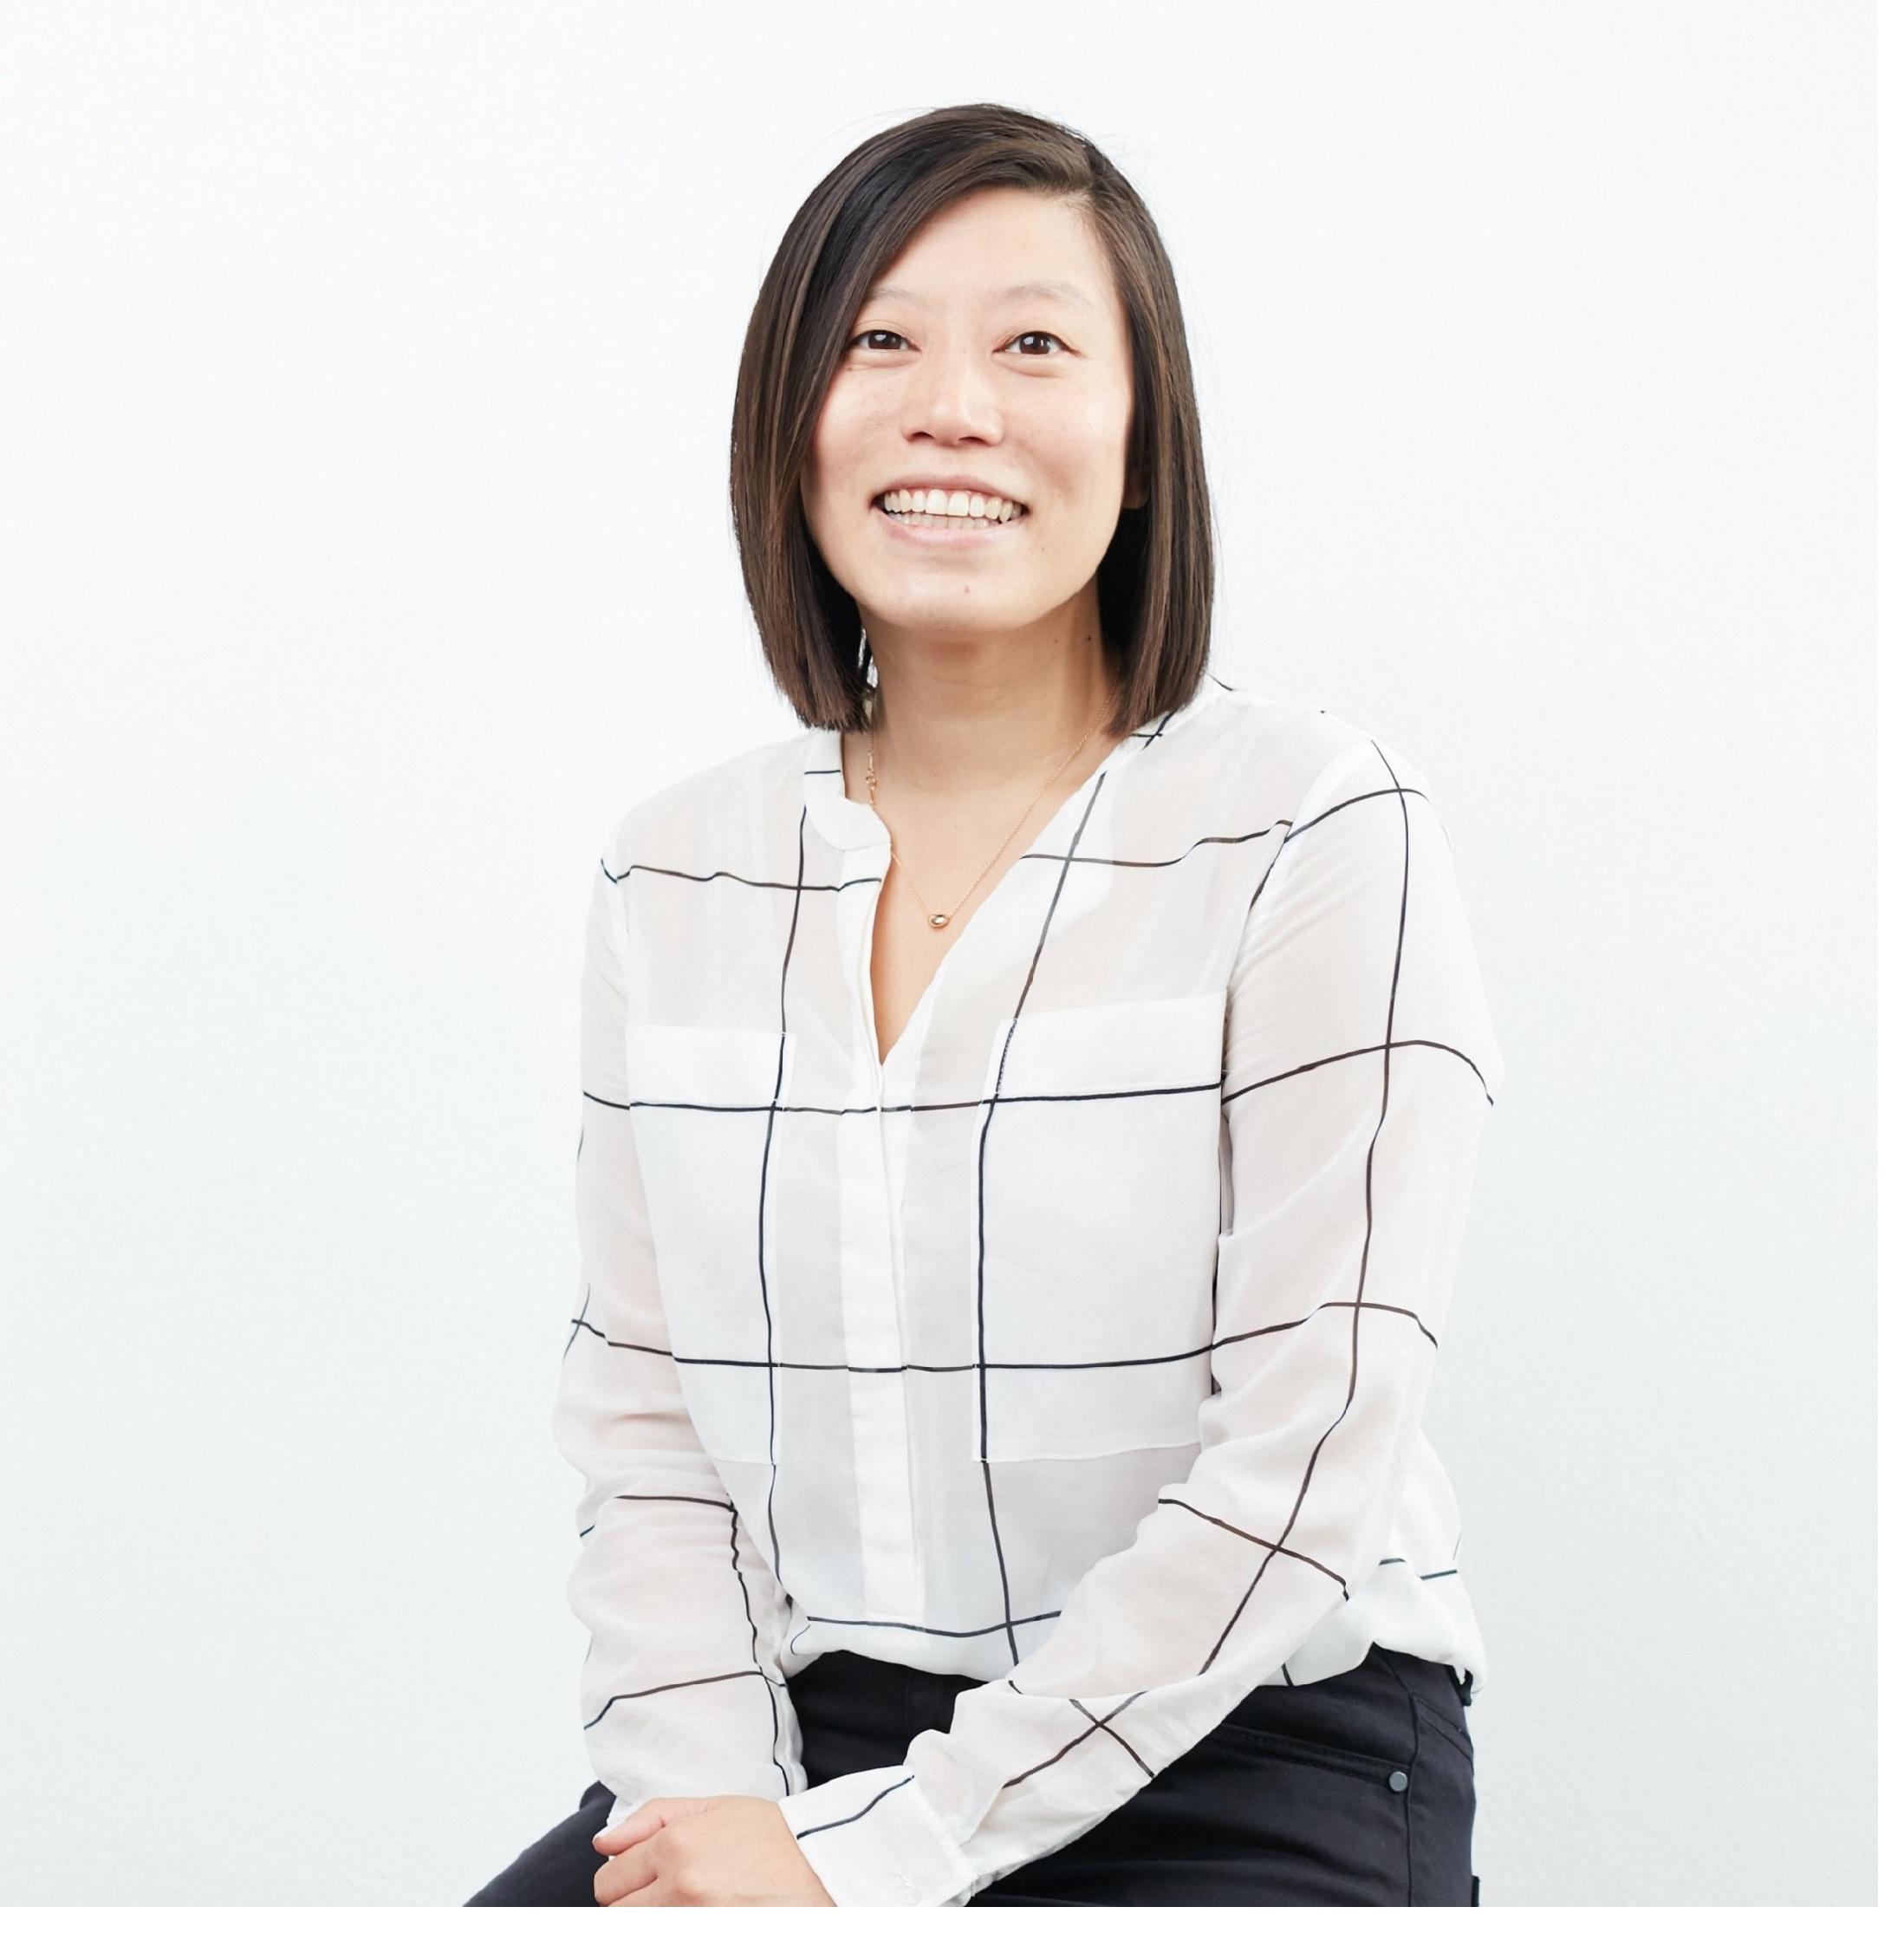 Katherine Lazaro - Business AnalystLinked In